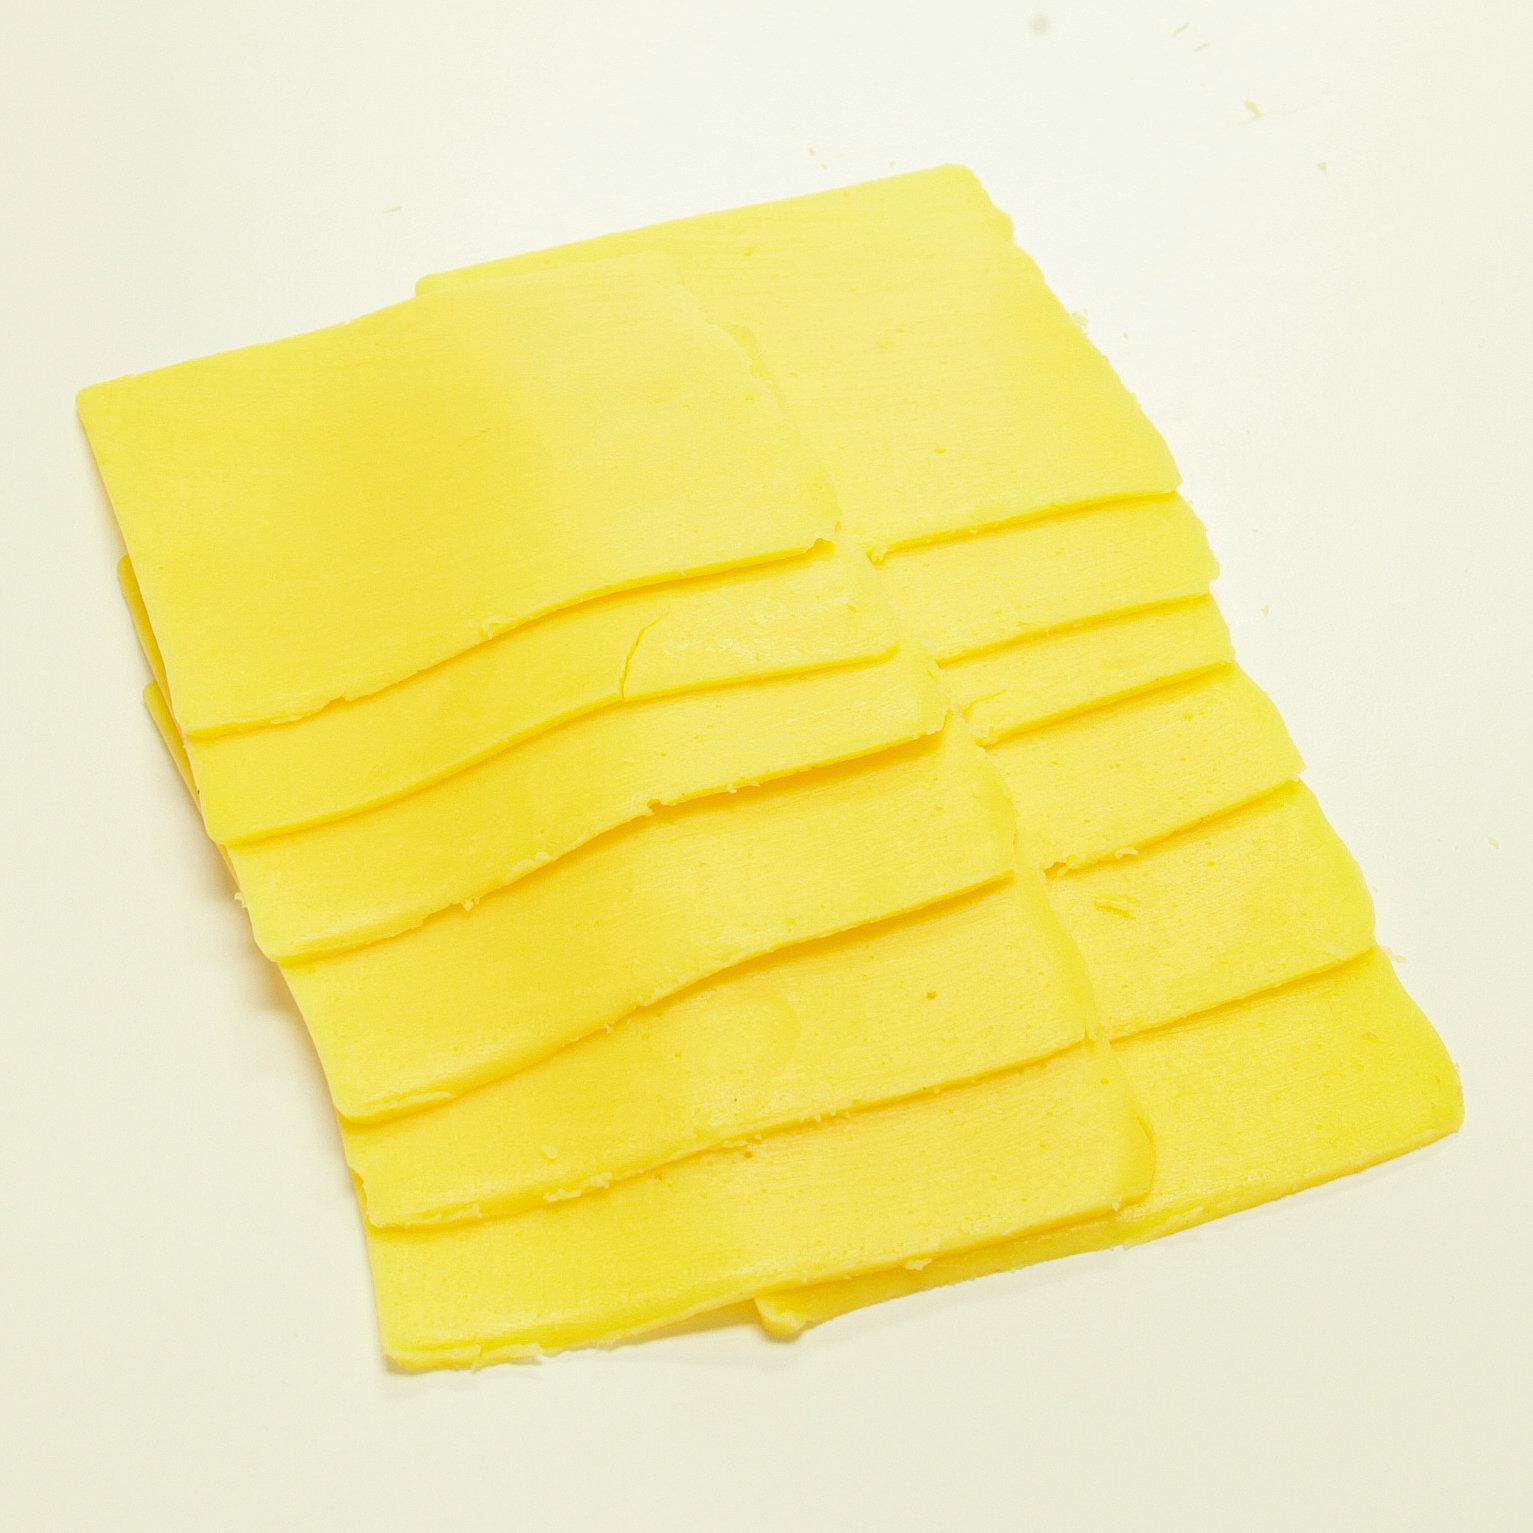 American Cheese (Yellow), 8 oz. 00115